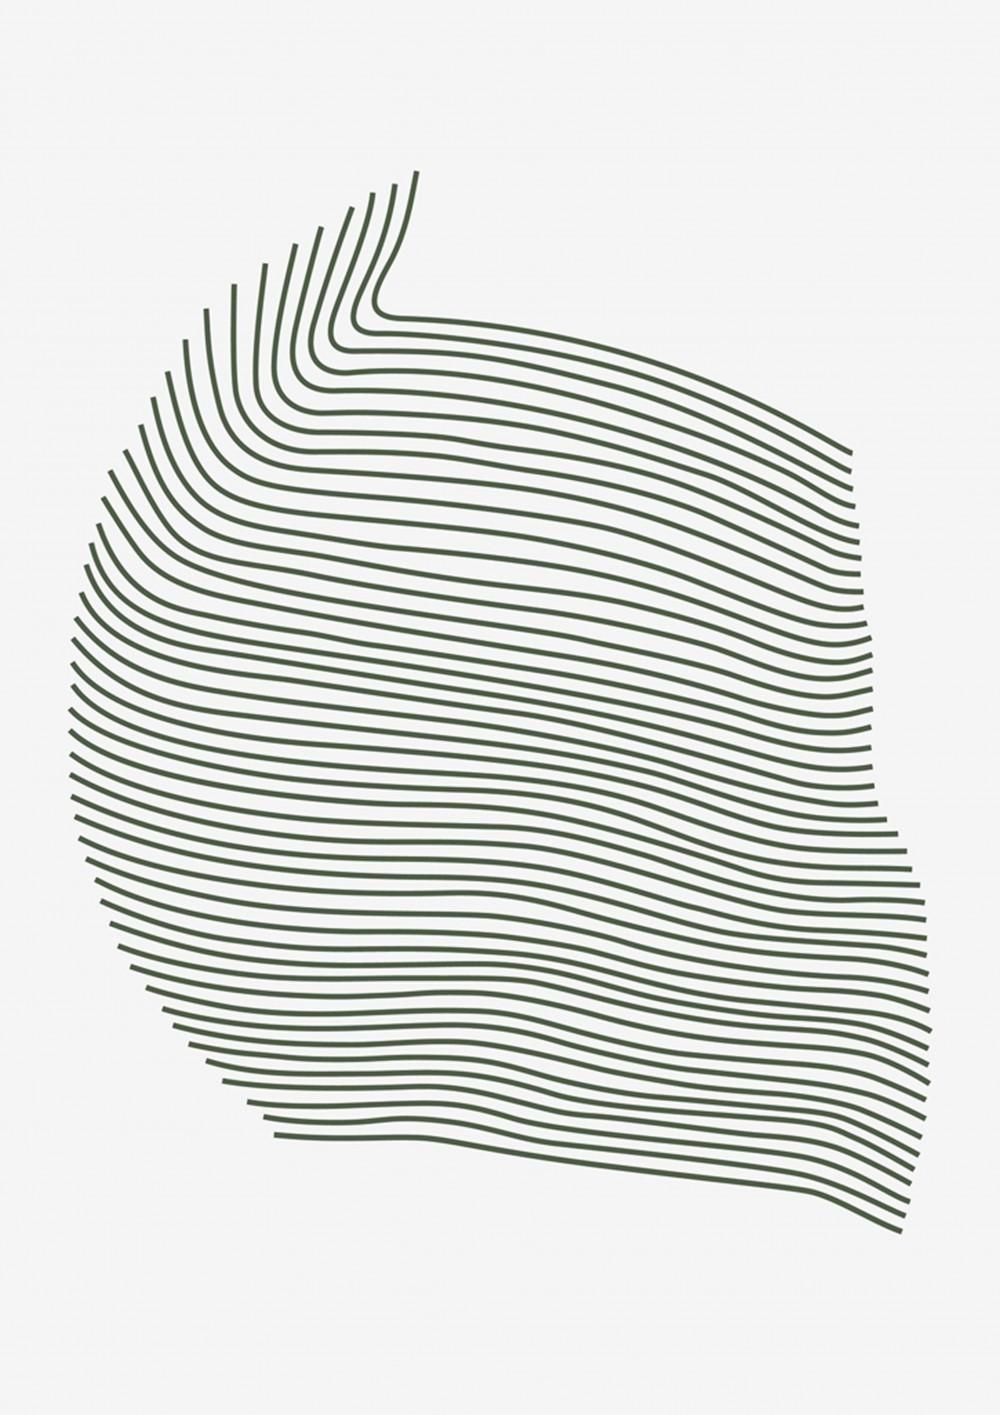 Litho ligne - © Pierre Charpin